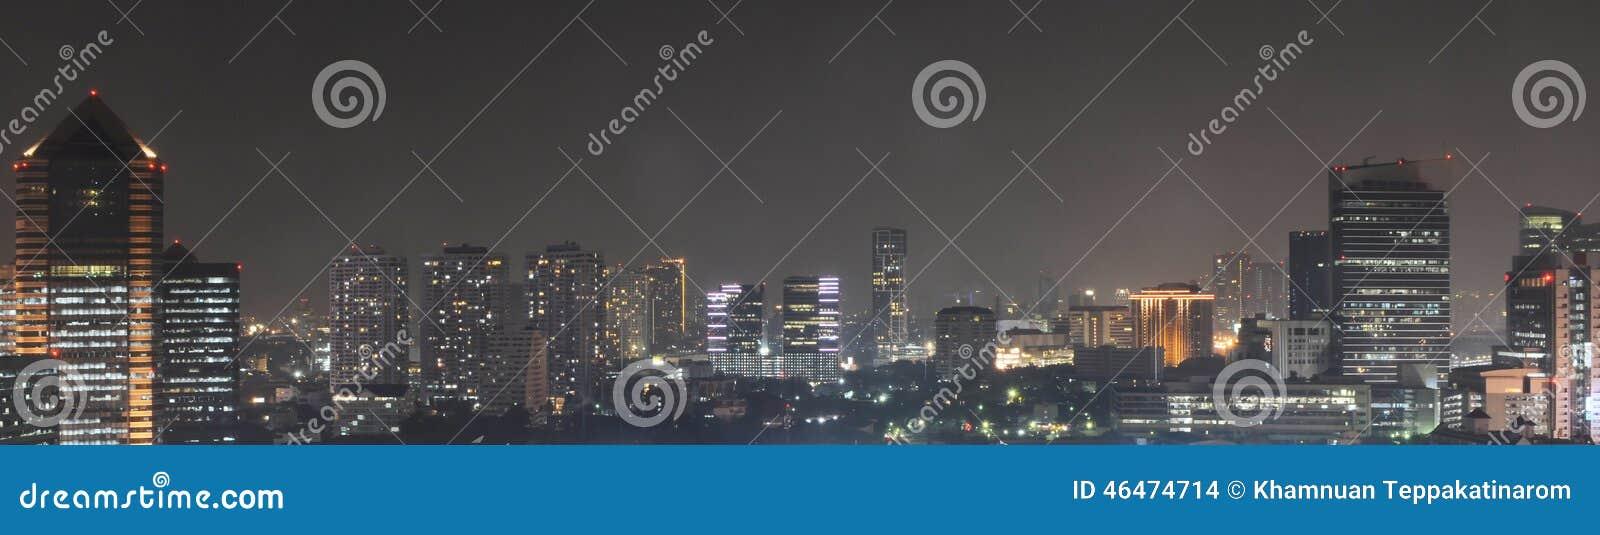 Cidade Scape